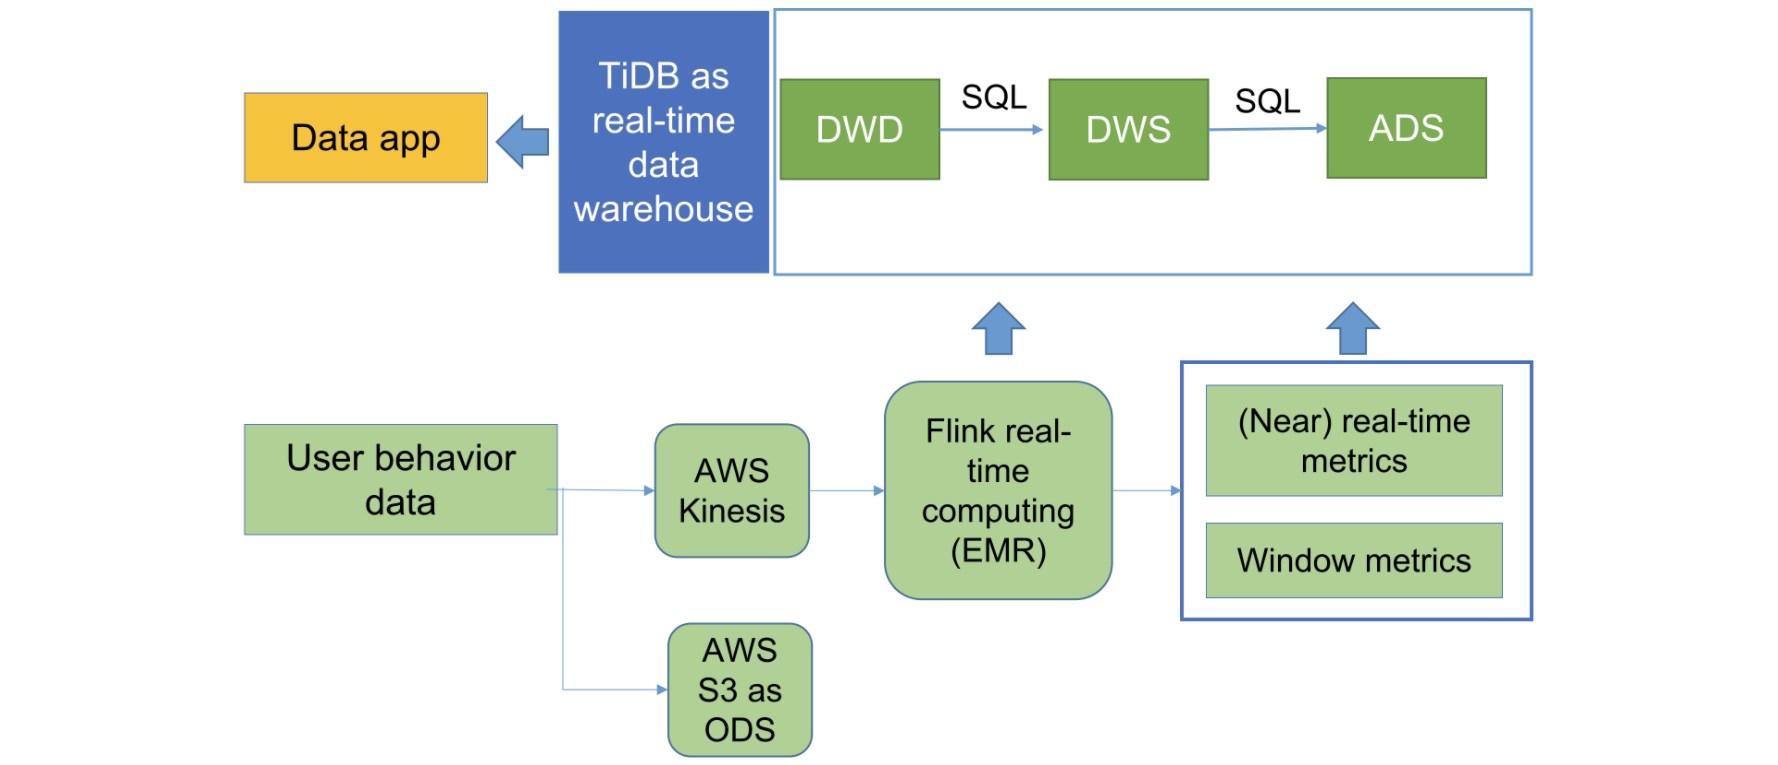 PatSnap data analytics platform architecture